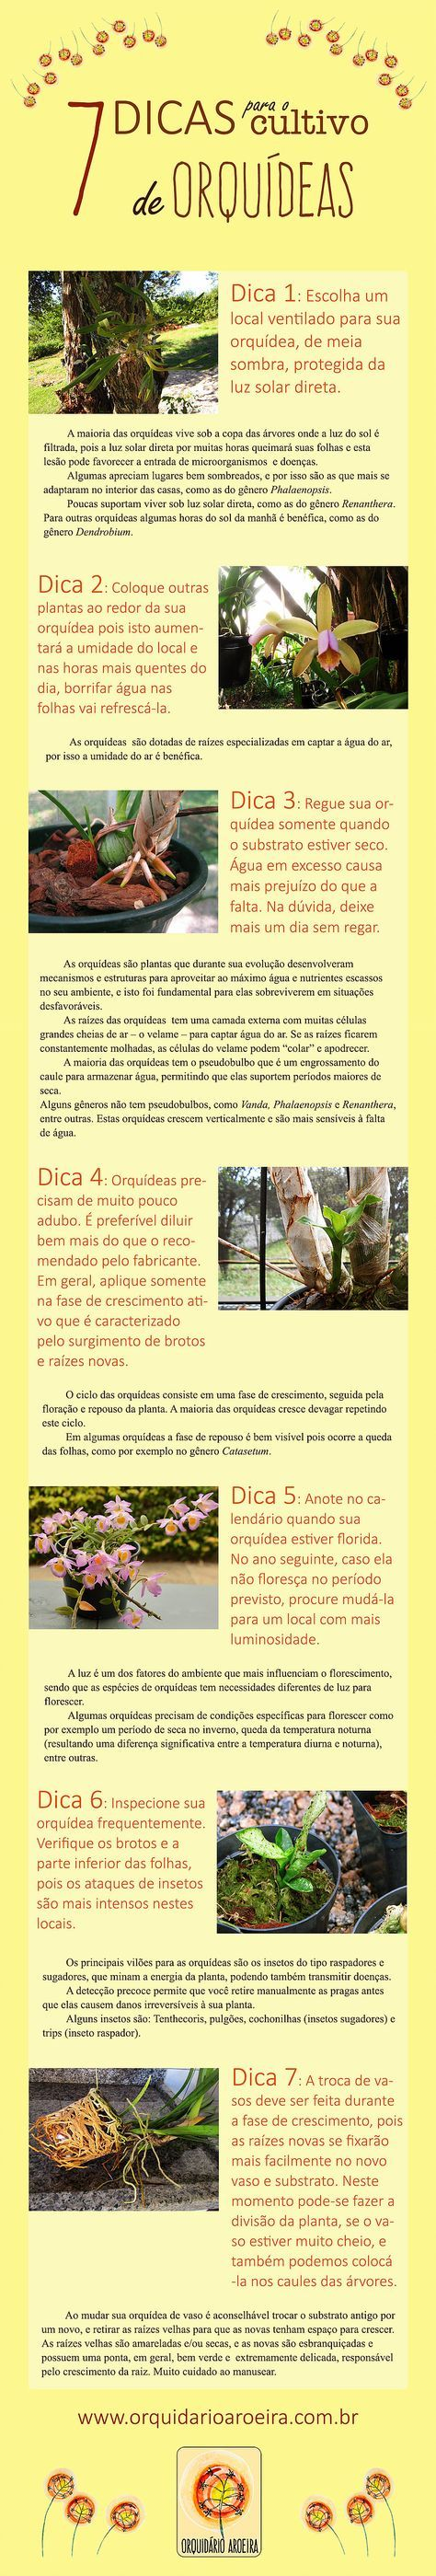 Cultivo de orquídeas … does anybody have this in English?